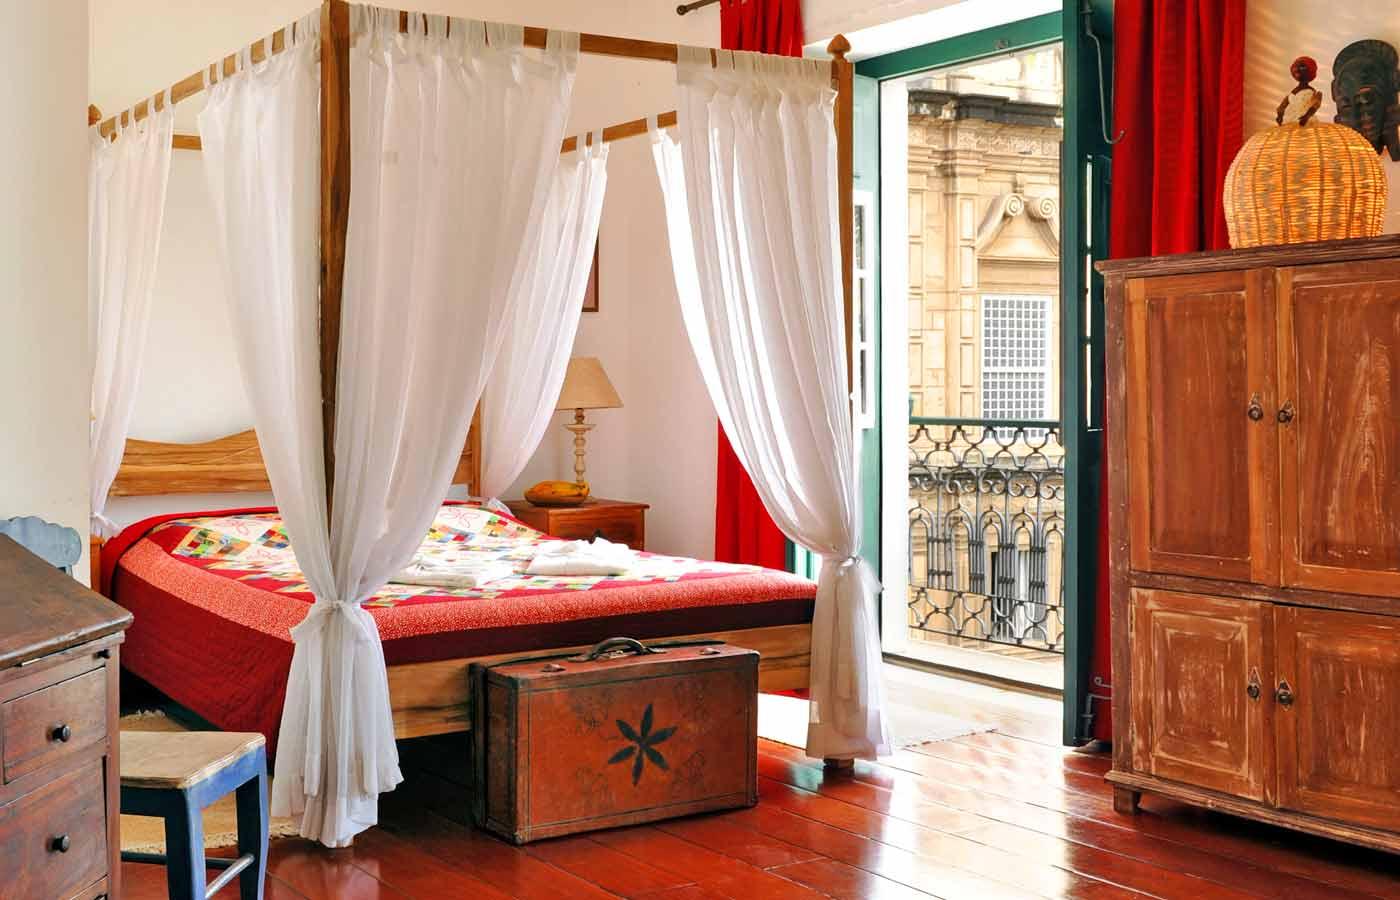 Hotel Villa Bahia - Luxury holidays to Salvador, Brazil